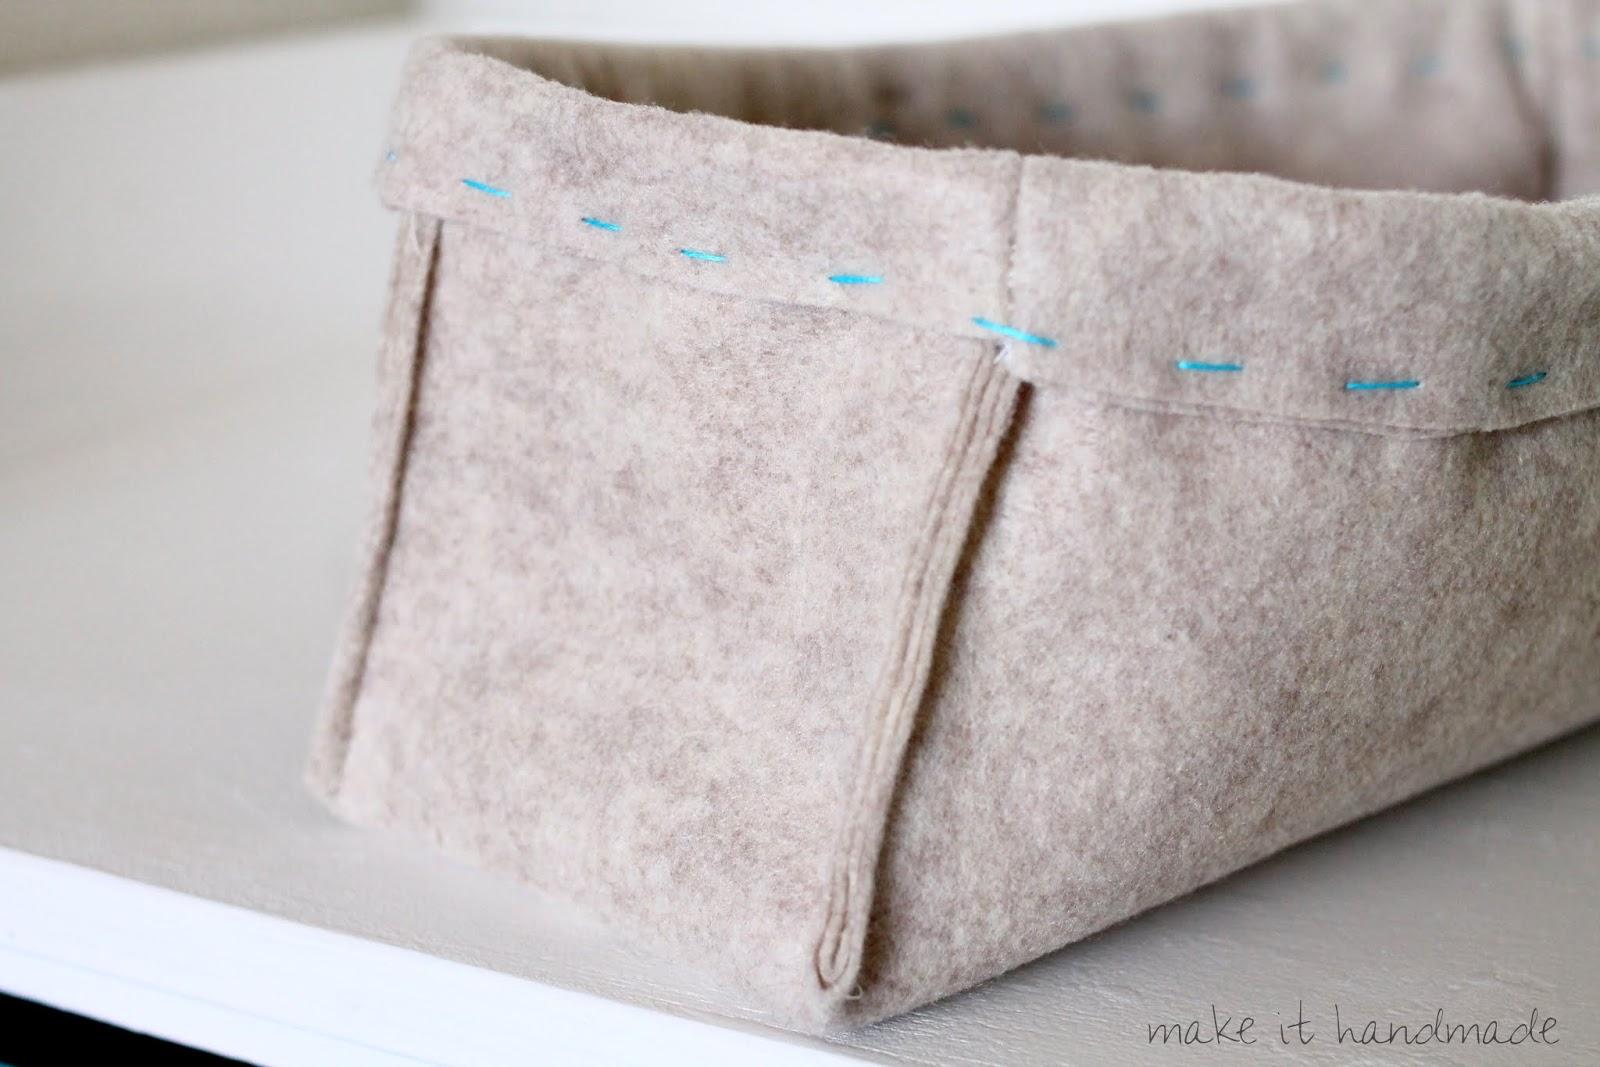 Handmade Baskets Tutorial : Make it handmade felt baskets in any size tutorial